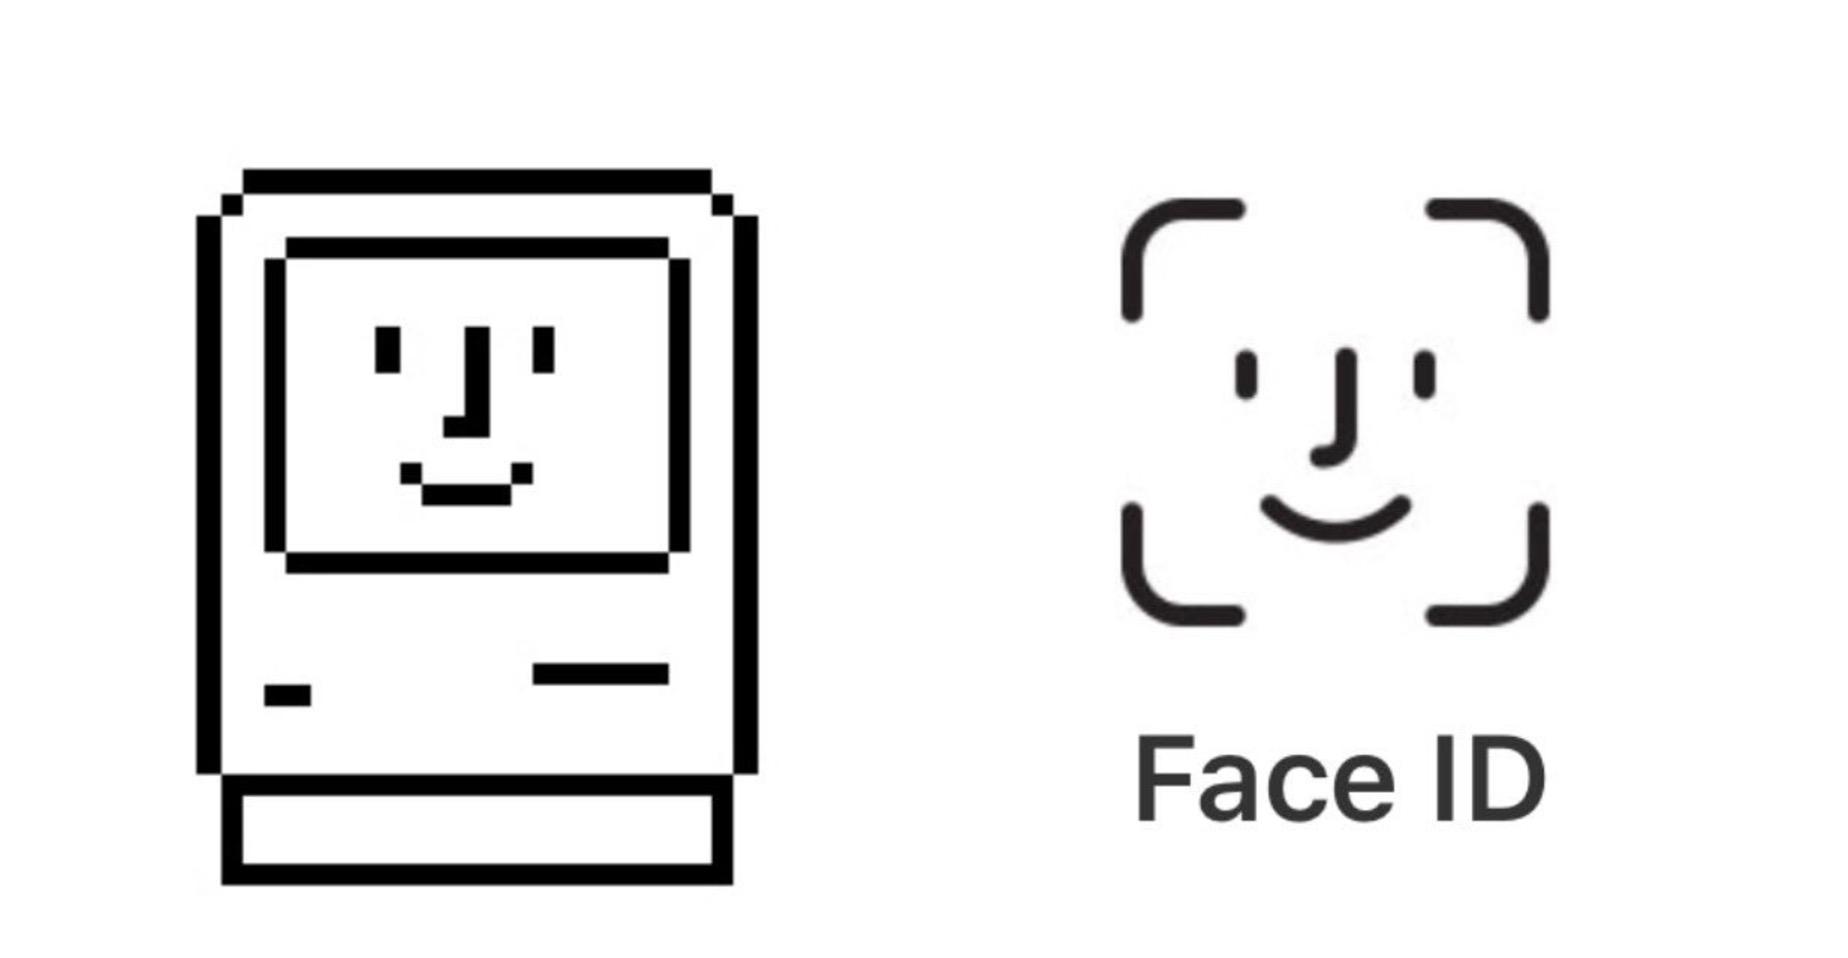 face-id-logo